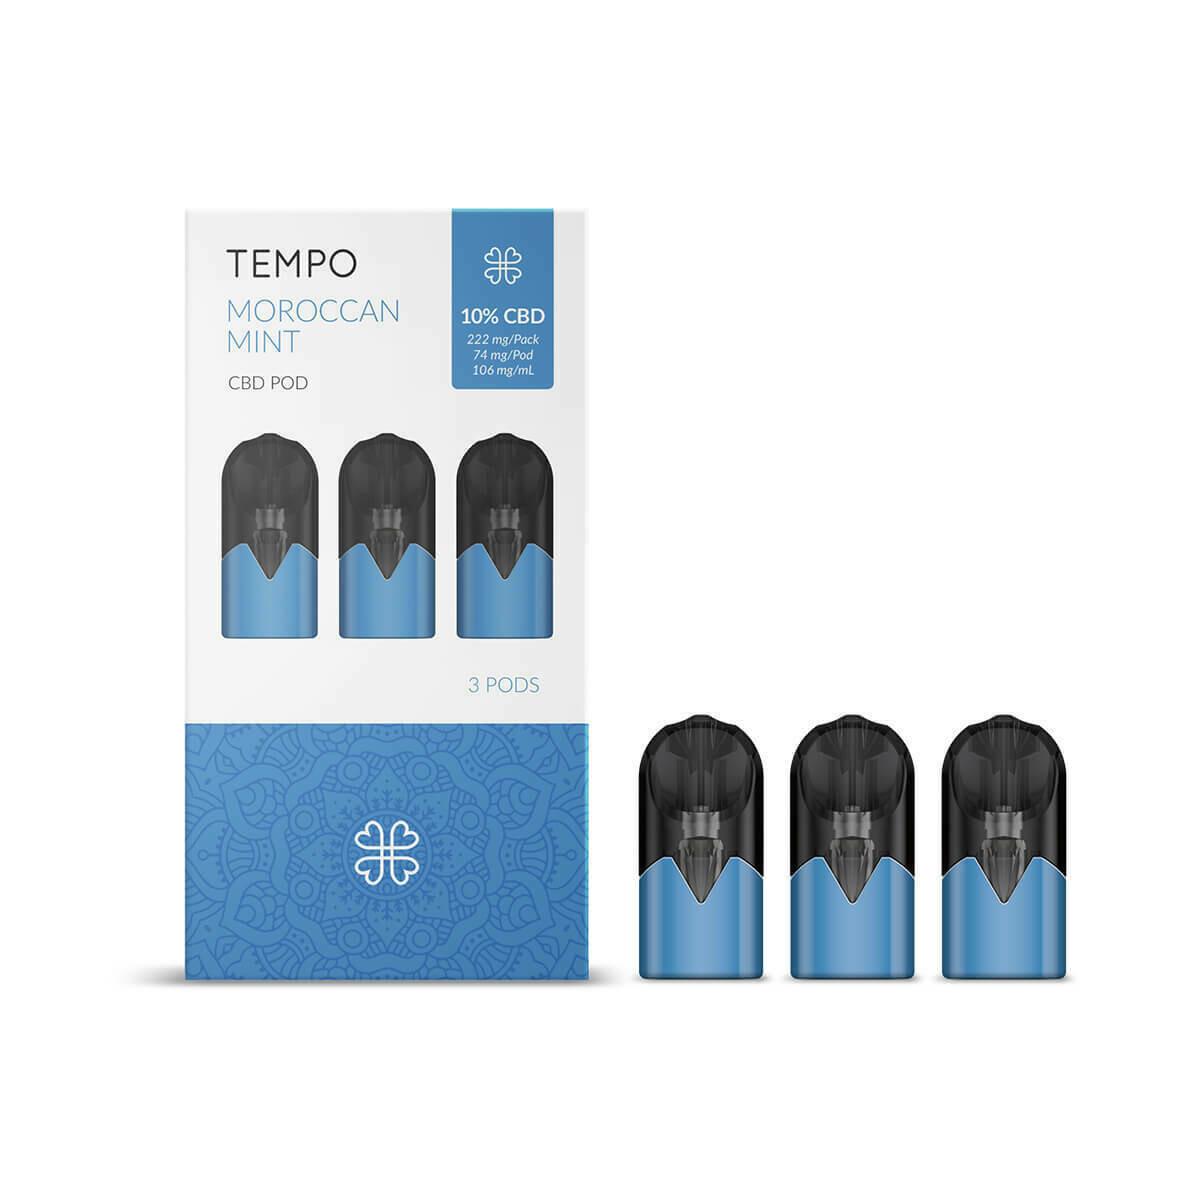 Harmony TEMPO Moroccan Mint 3 Pods Pack 222mg CBD (3x74mg)